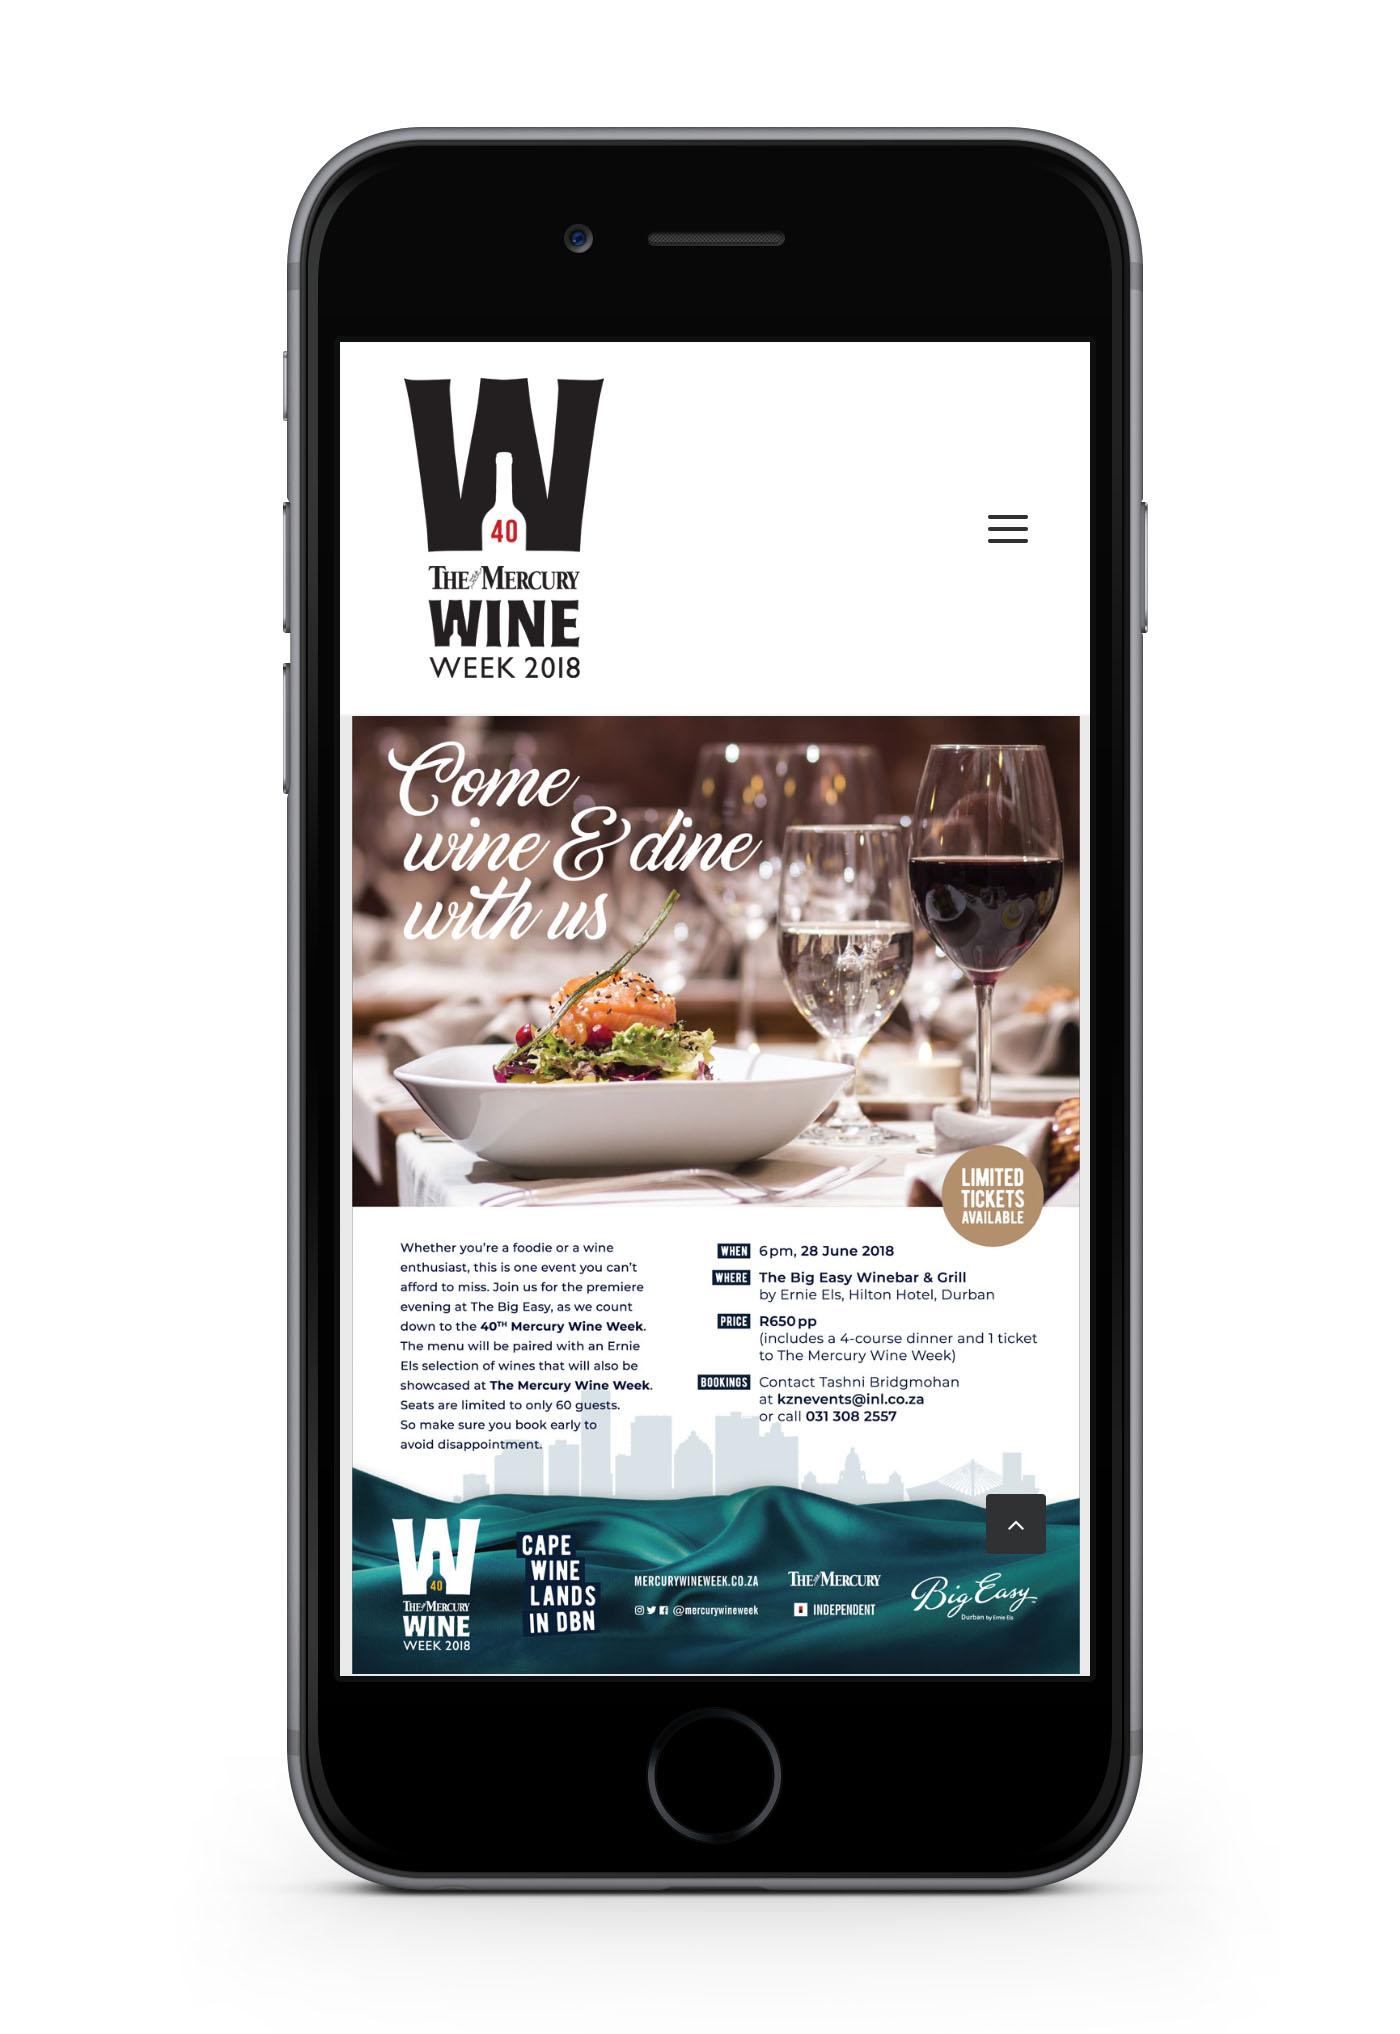 mercury wine week web-design-portfolio-webdoor-responsive-web-design-agency-hillcrest-kwazulu-natal-phone